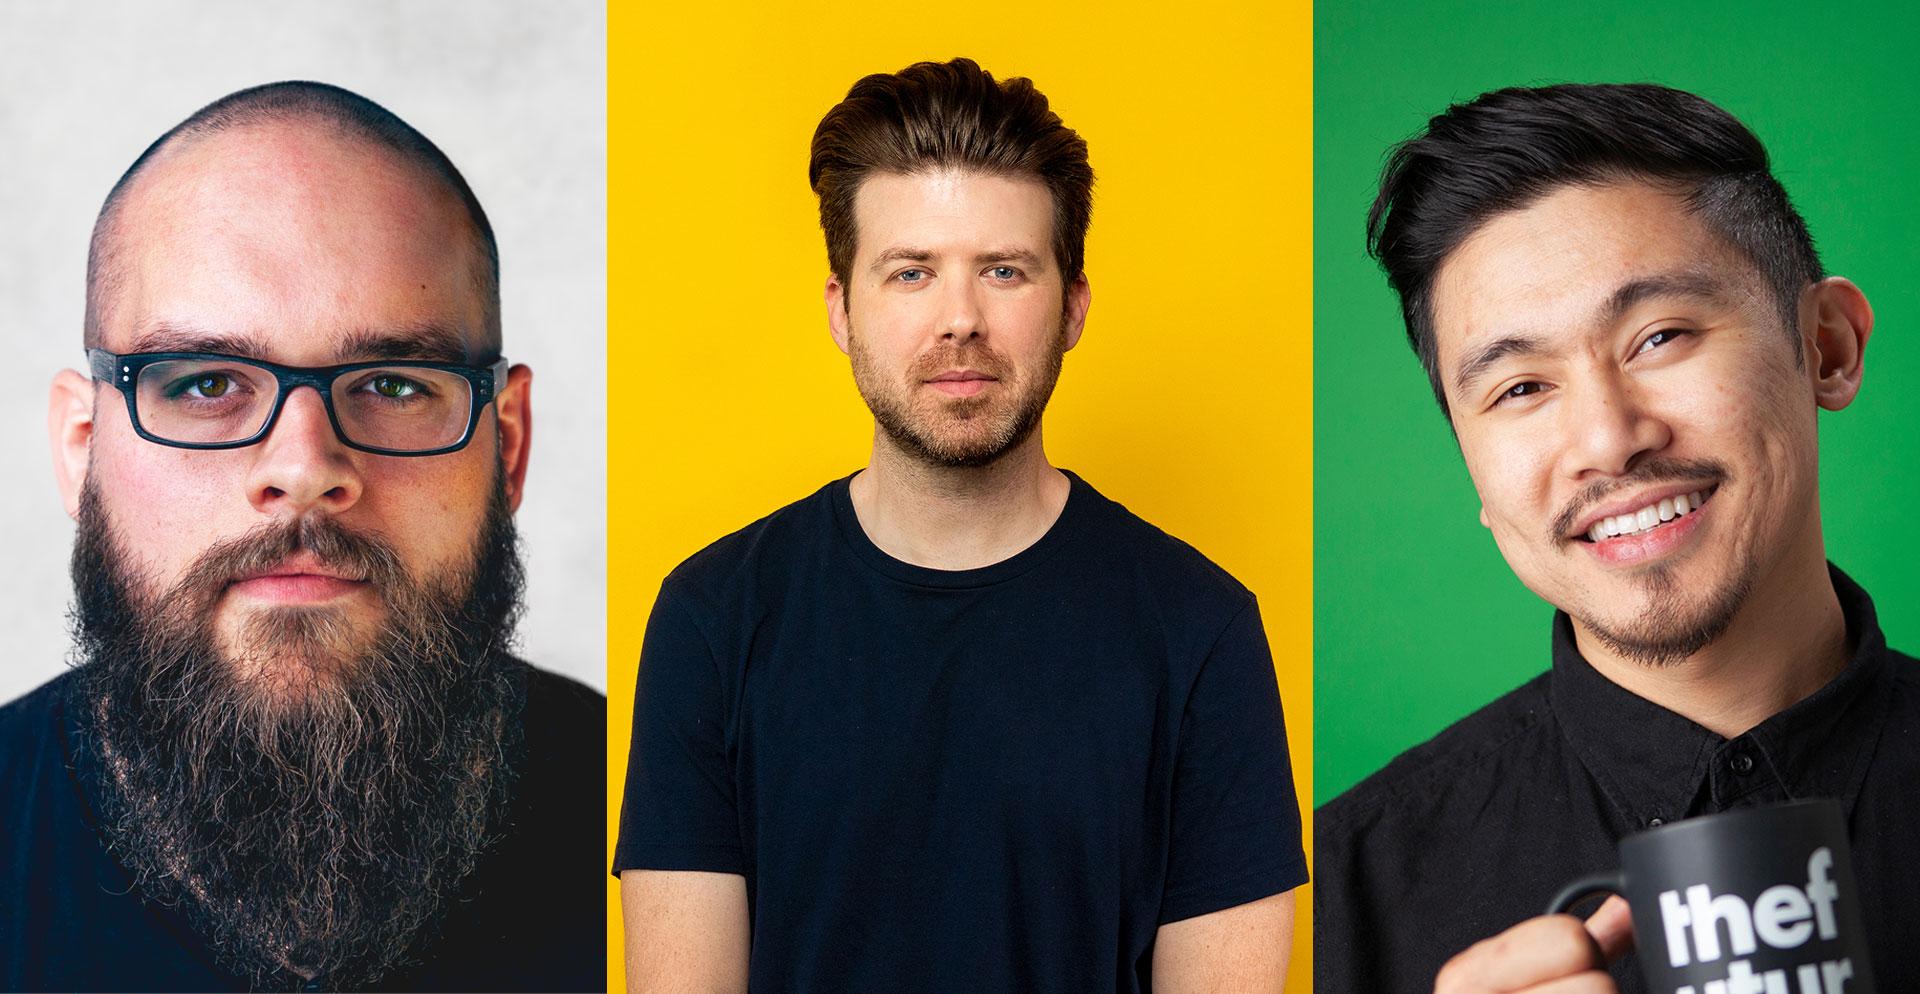 Tune into webinars with Ben Burns, Greg Gunn, and Matthew Encina.